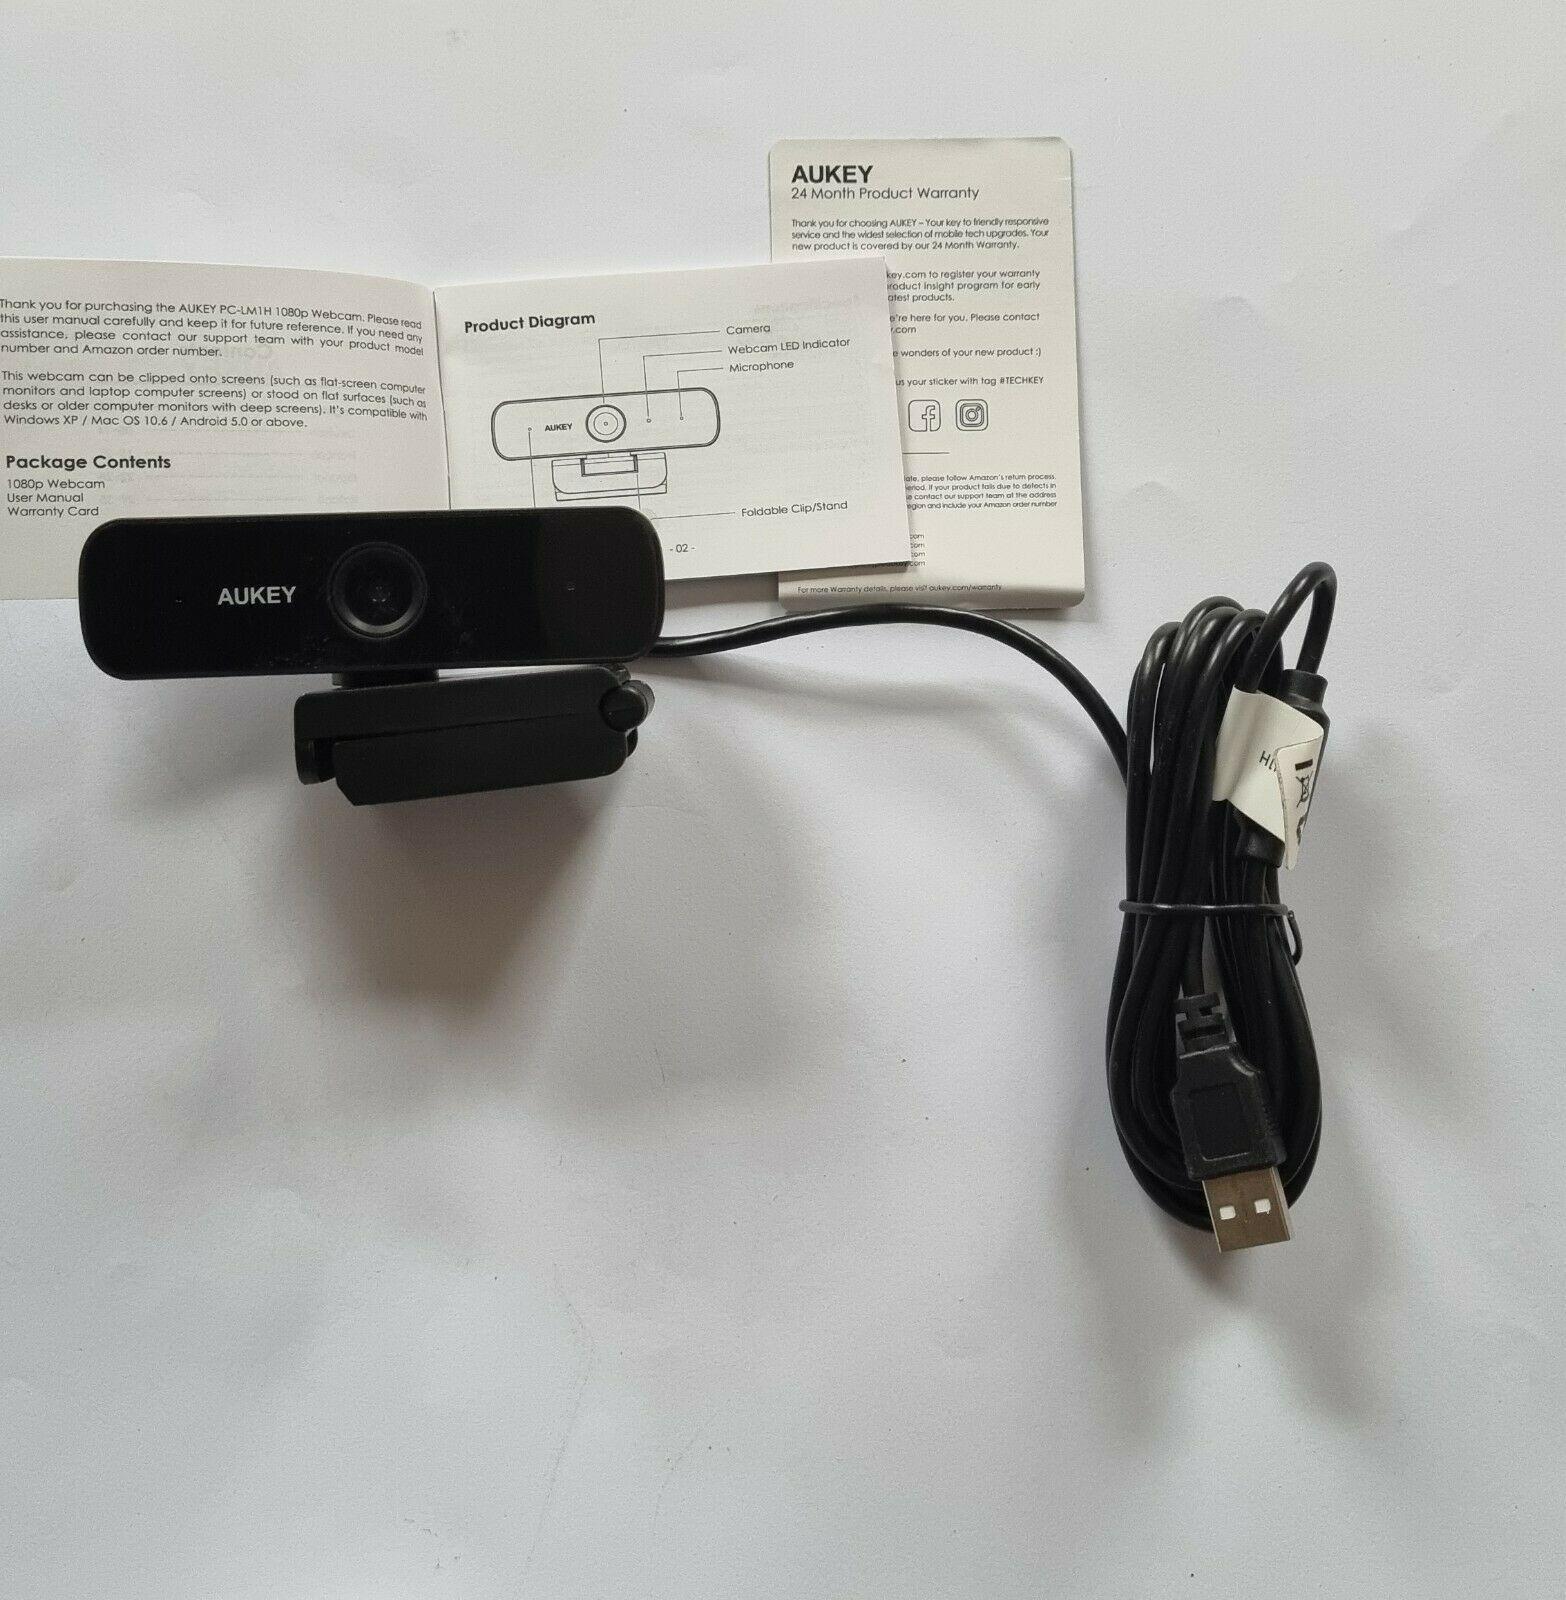 38980 1 aukey webcam 1080p full hd mit